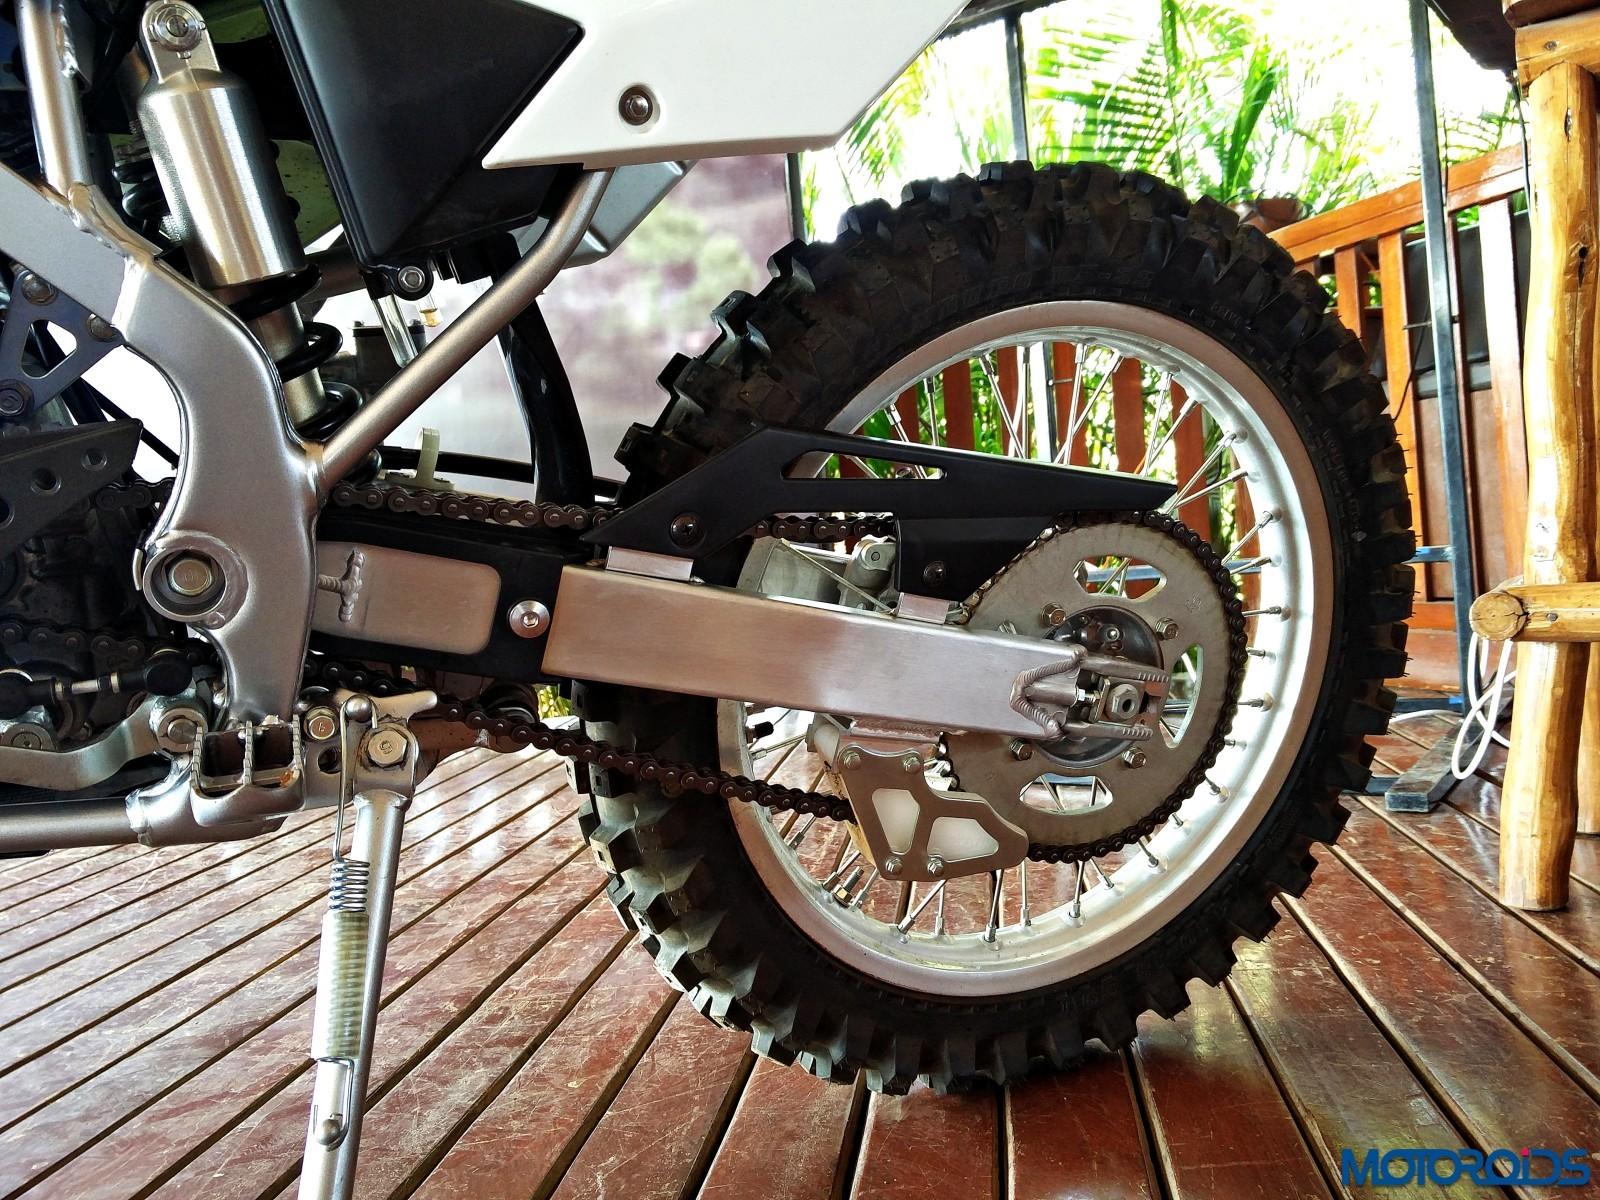 Kawasaki-KLX140G-Ride-Experience-9